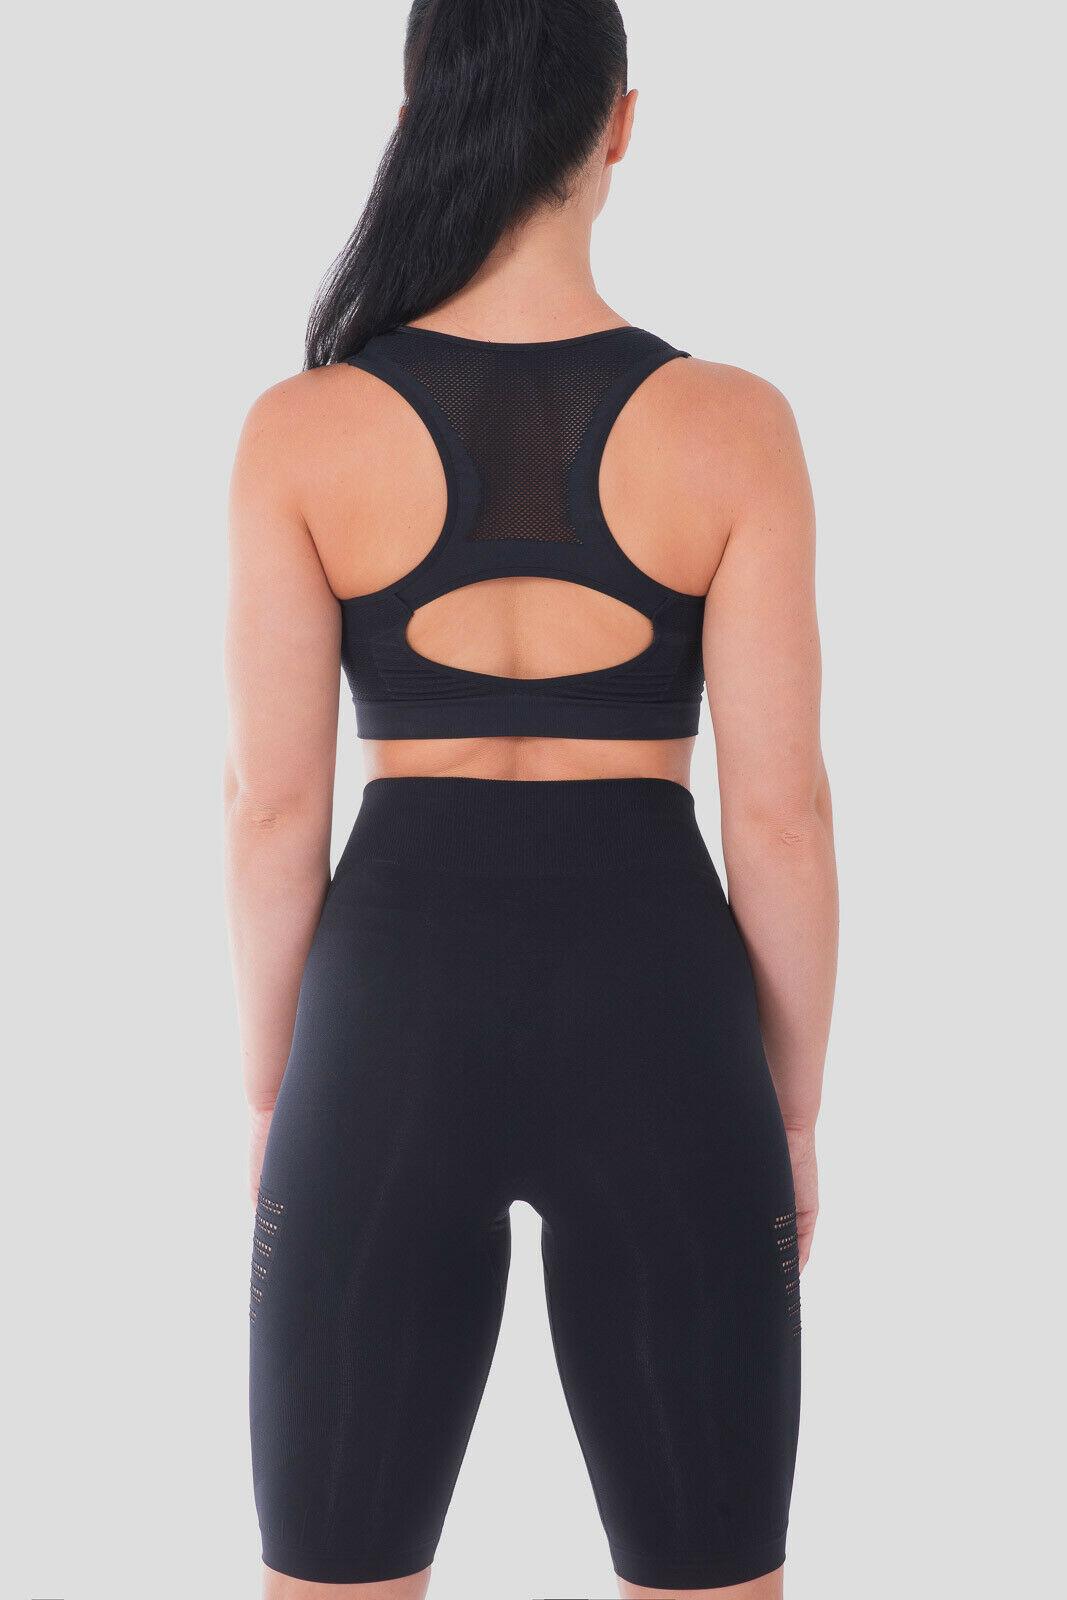 Bellissima-Women-039-s-Sport-Bra-Running-Yoga-Workout-Fitness-Racerback-Seamless thumbnail 16